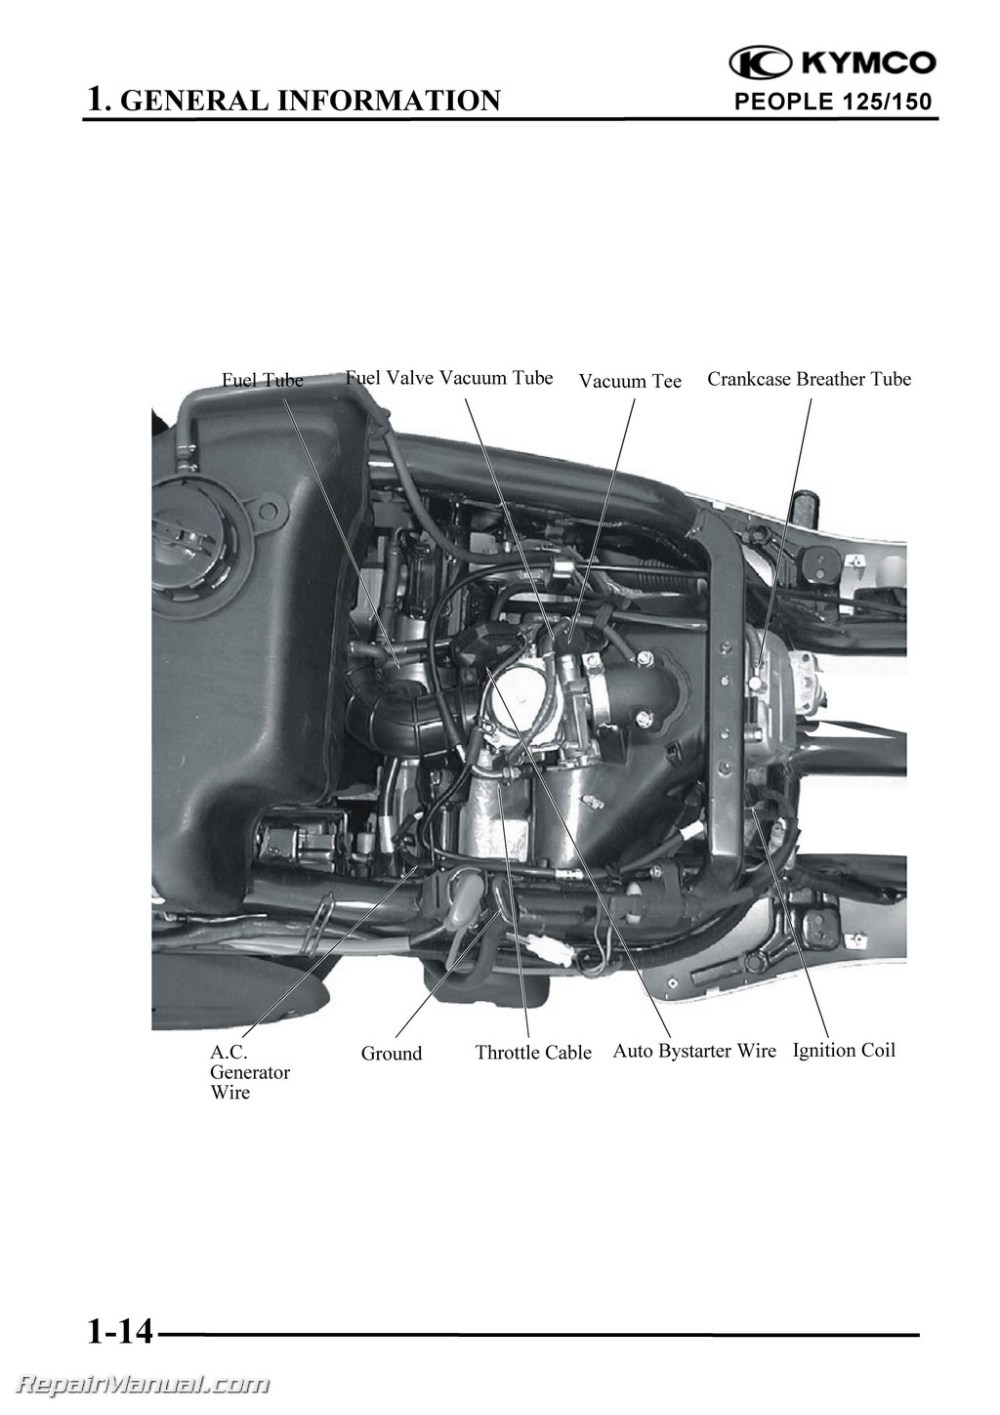 medium resolution of kymco person 150 wiring diagram